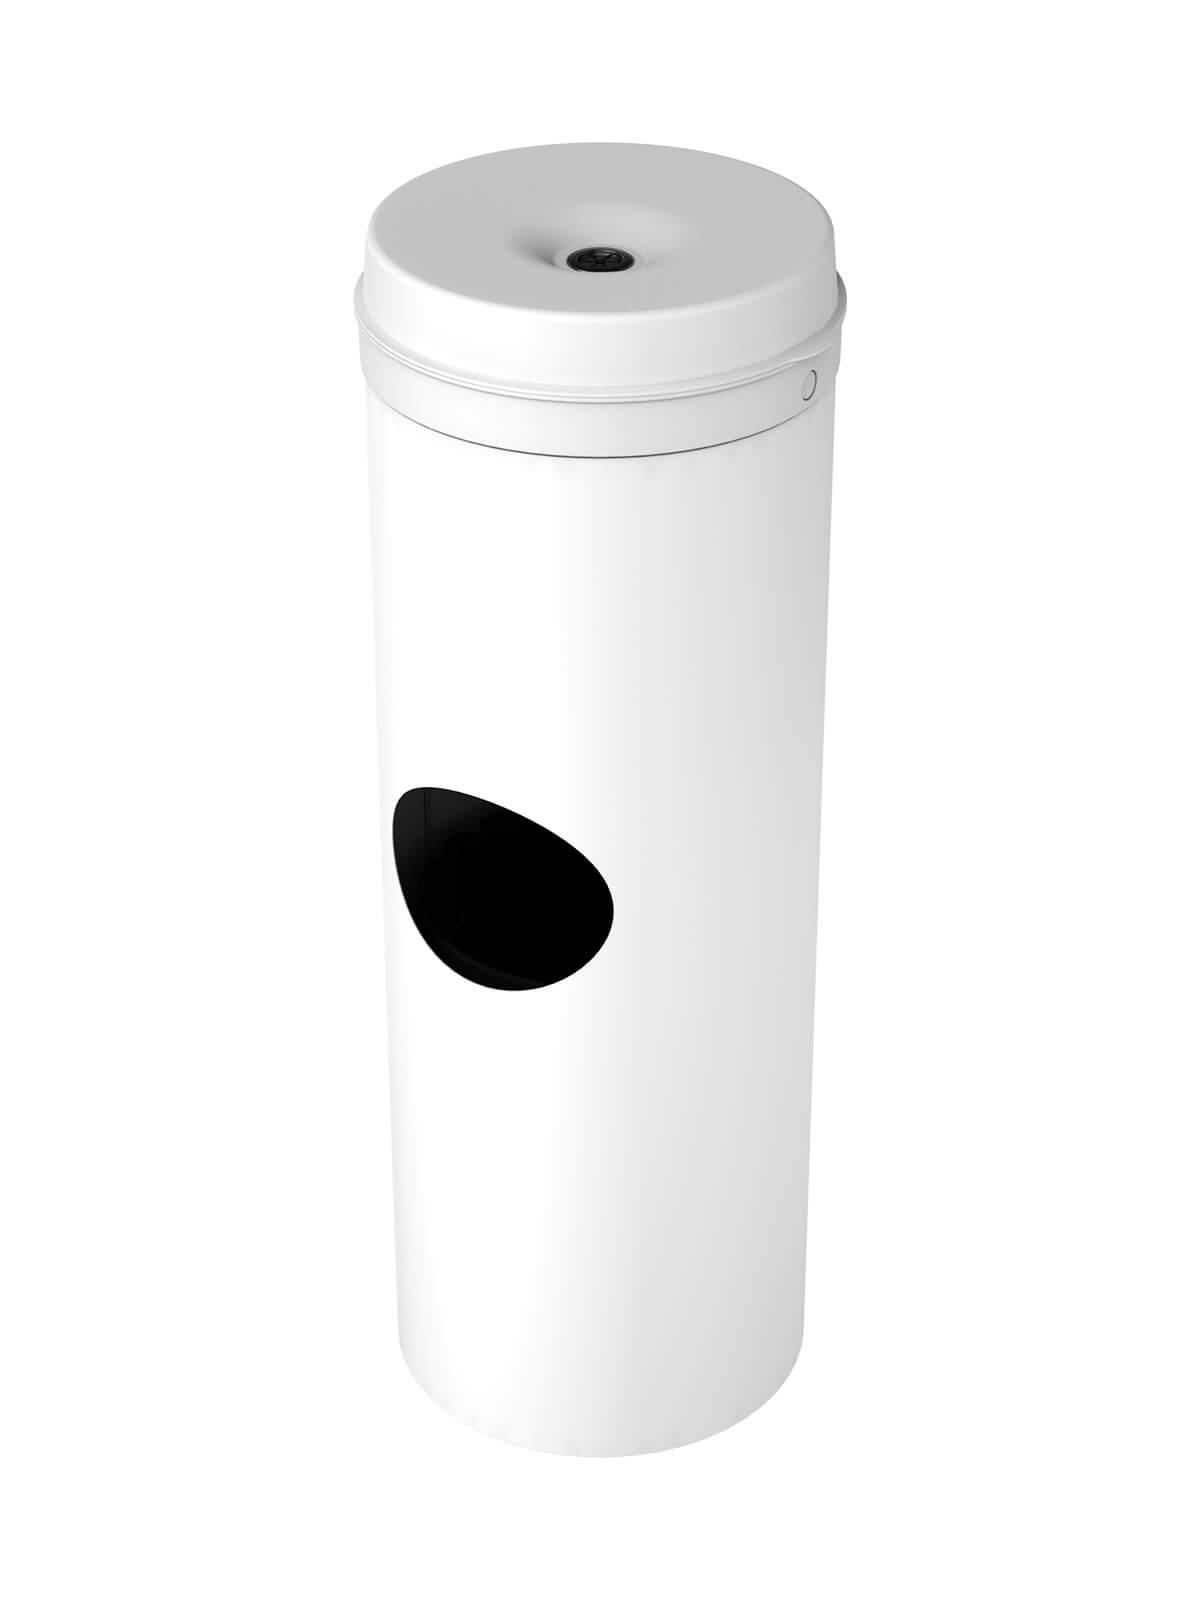 CLEANLI GO - Single - Full-Wipes - White